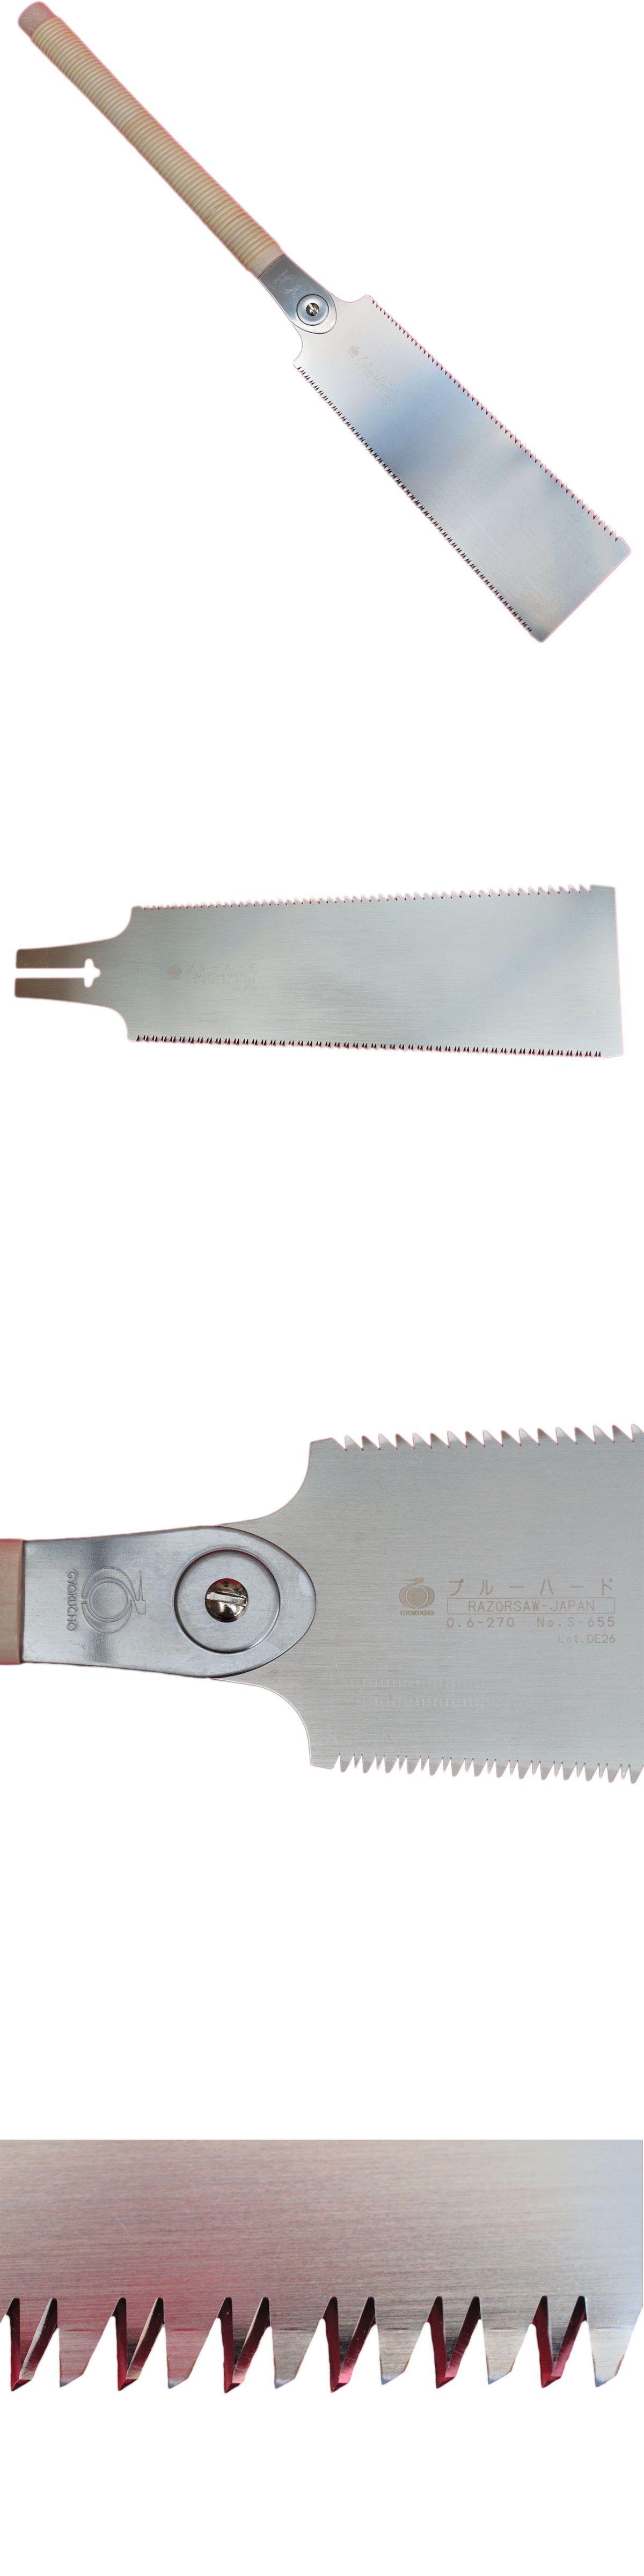 Kakuri Corporation GIKOU RYOBA SAW Cutting Tool 240mm Double Edge Made in Japan